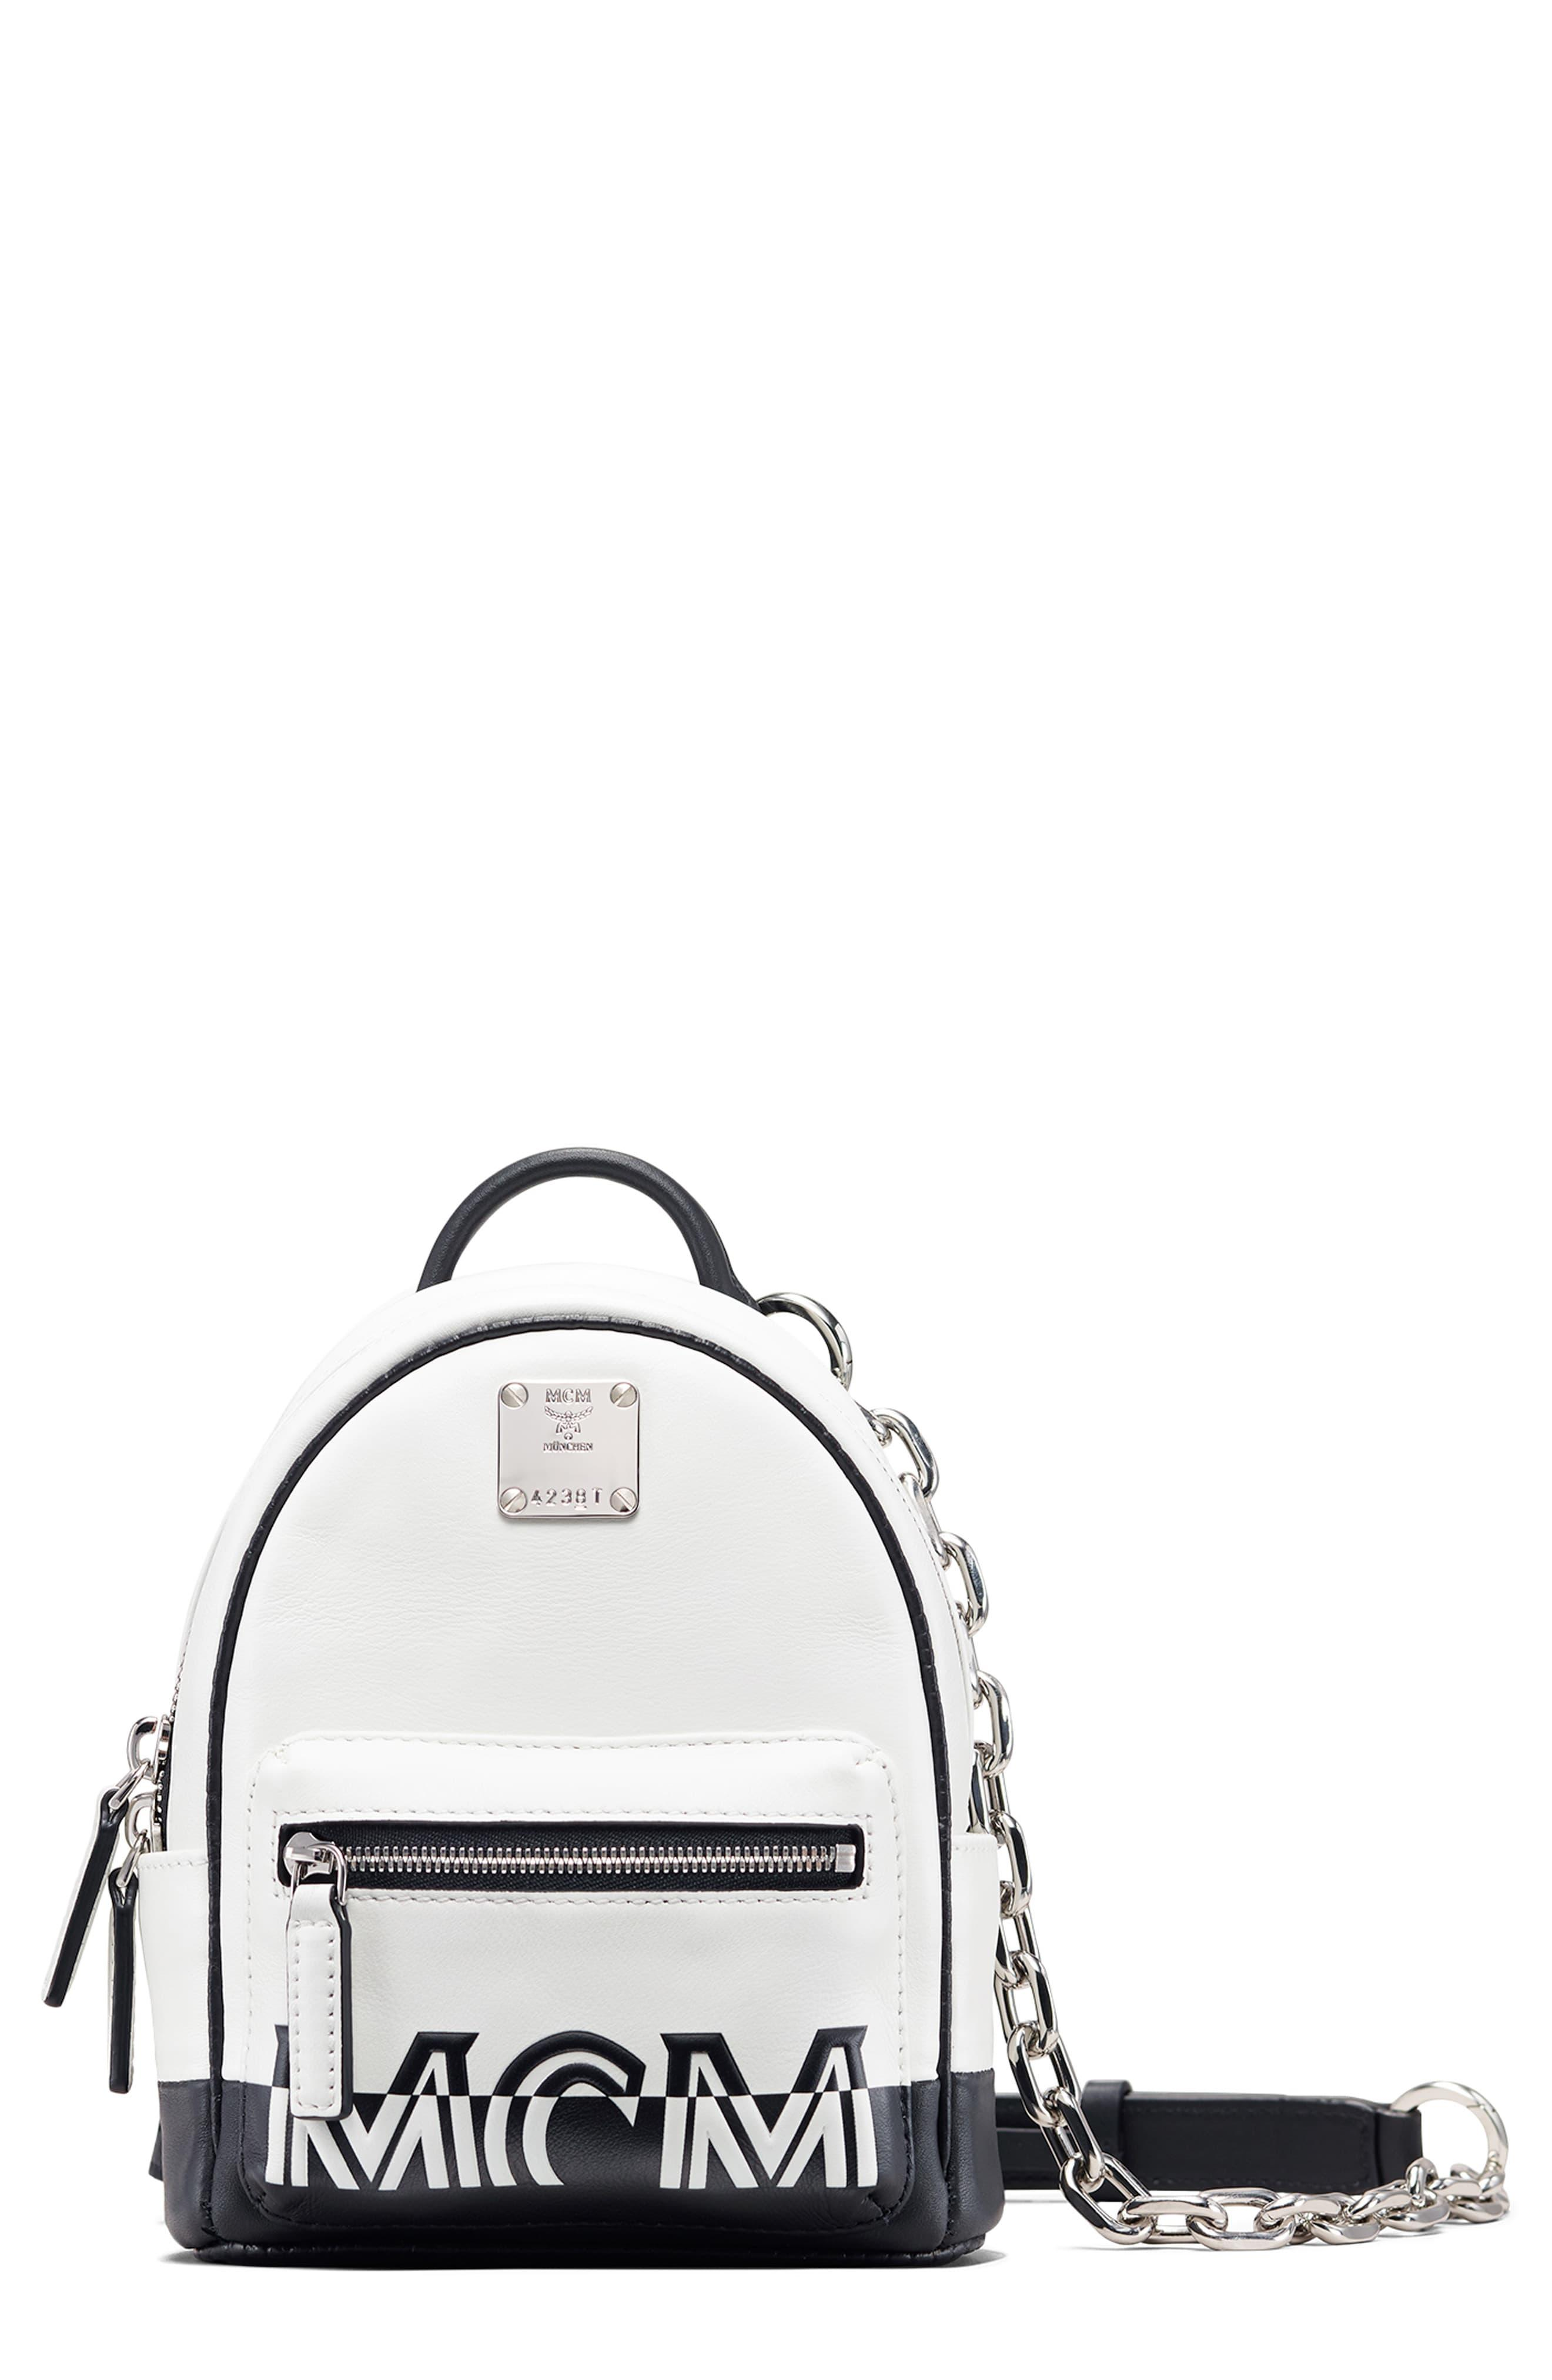 Mcm Mini Contrast Logo Leather Crossbody Bag In White Lyst